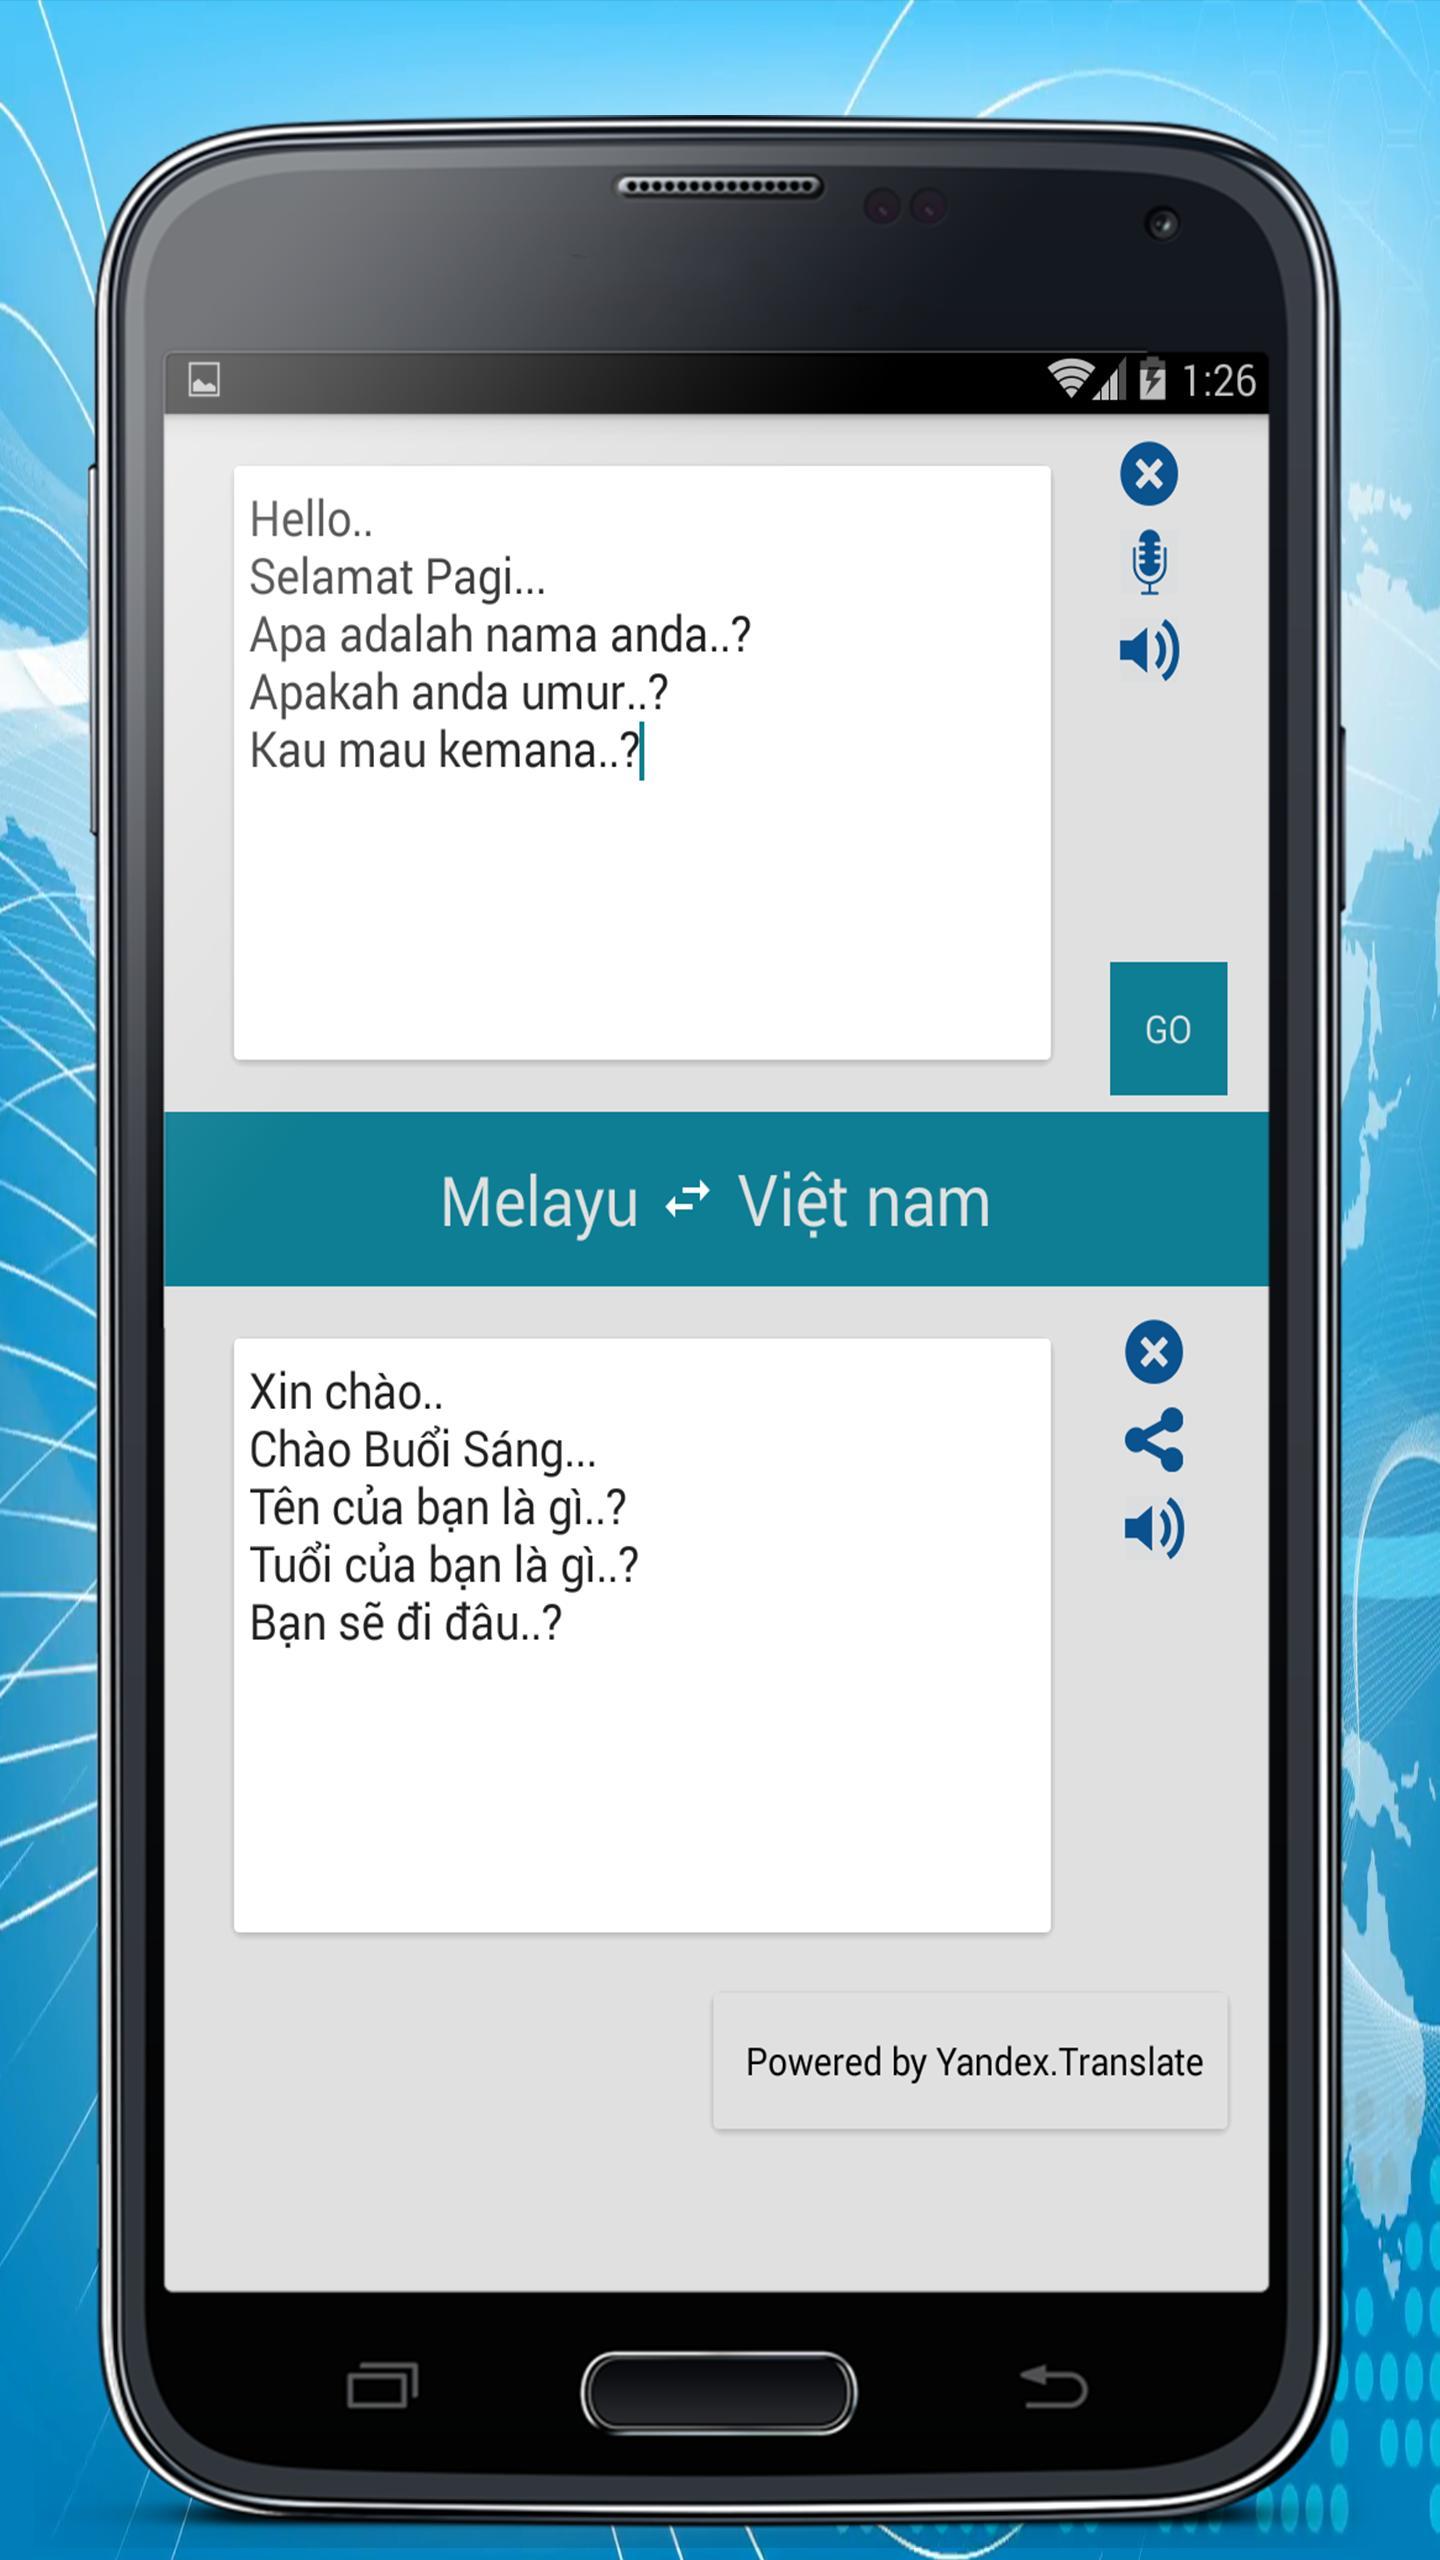 Malay Vietnamese Translator For Android